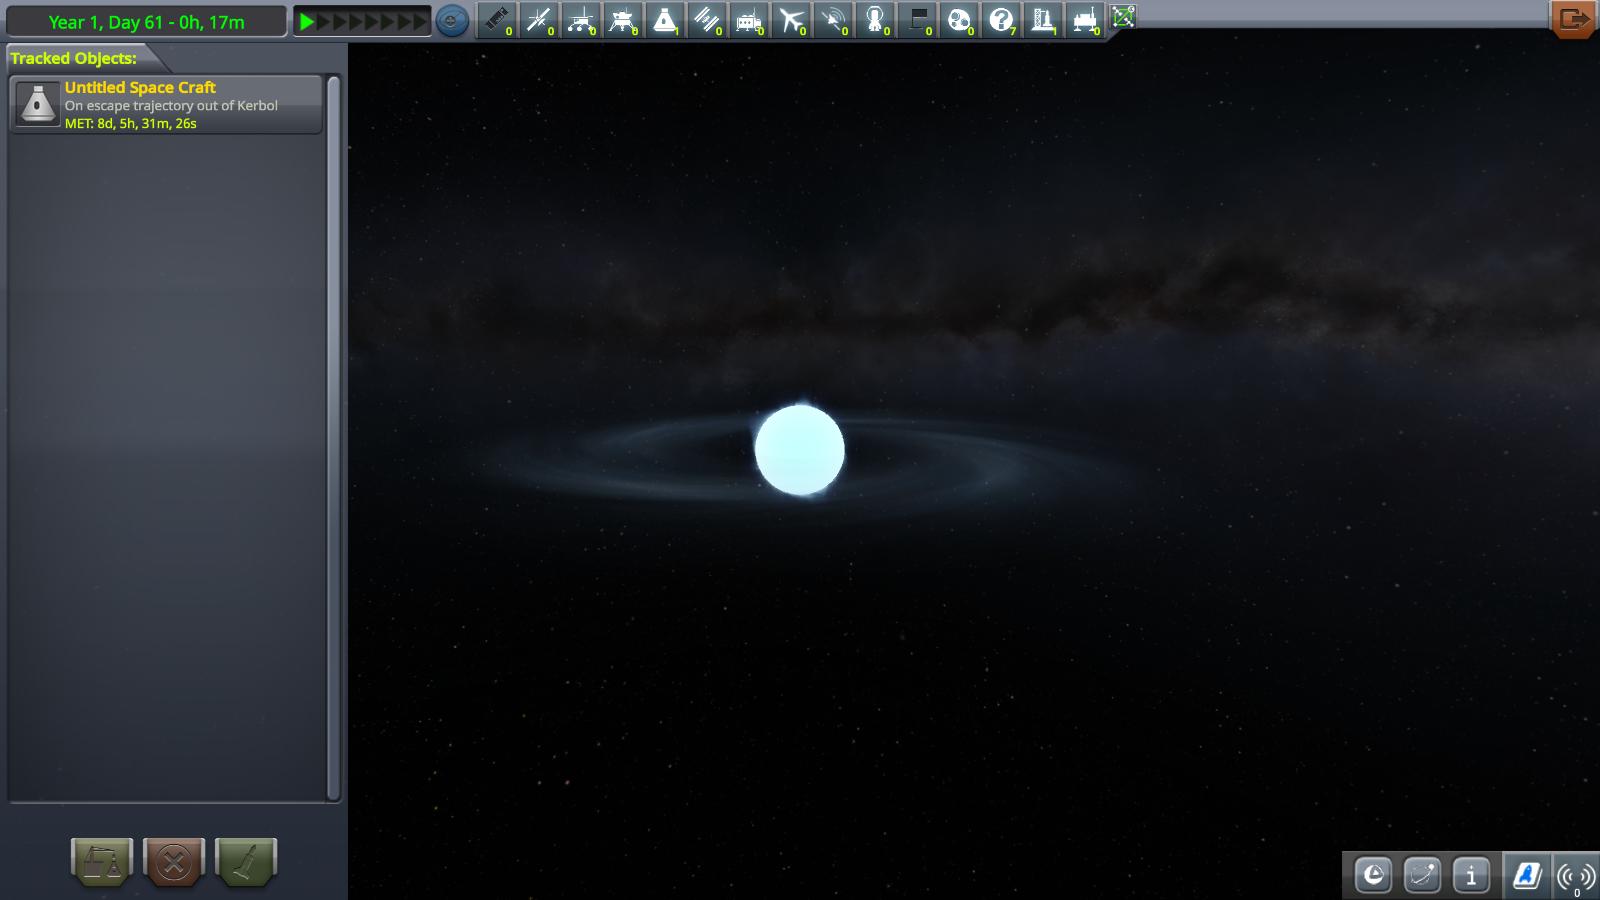 Screenshot_917.png